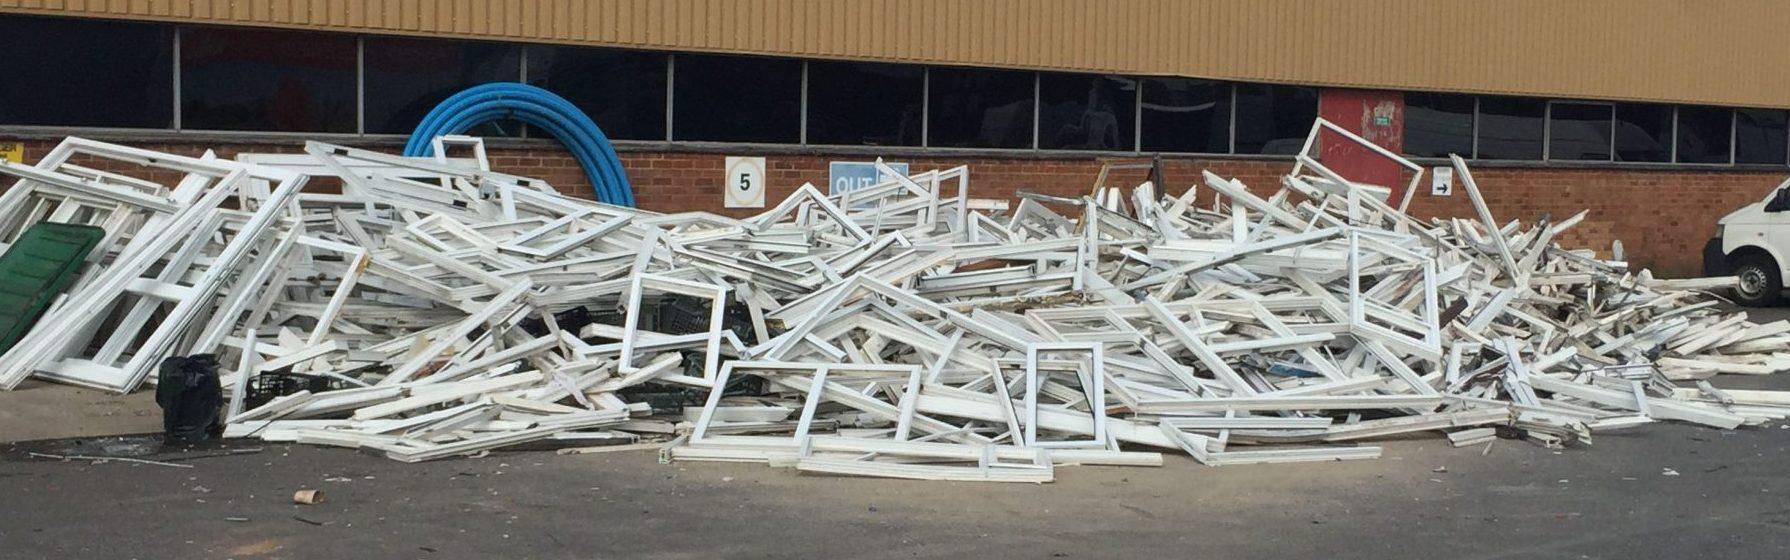 uPVC Recycling Aylesbury